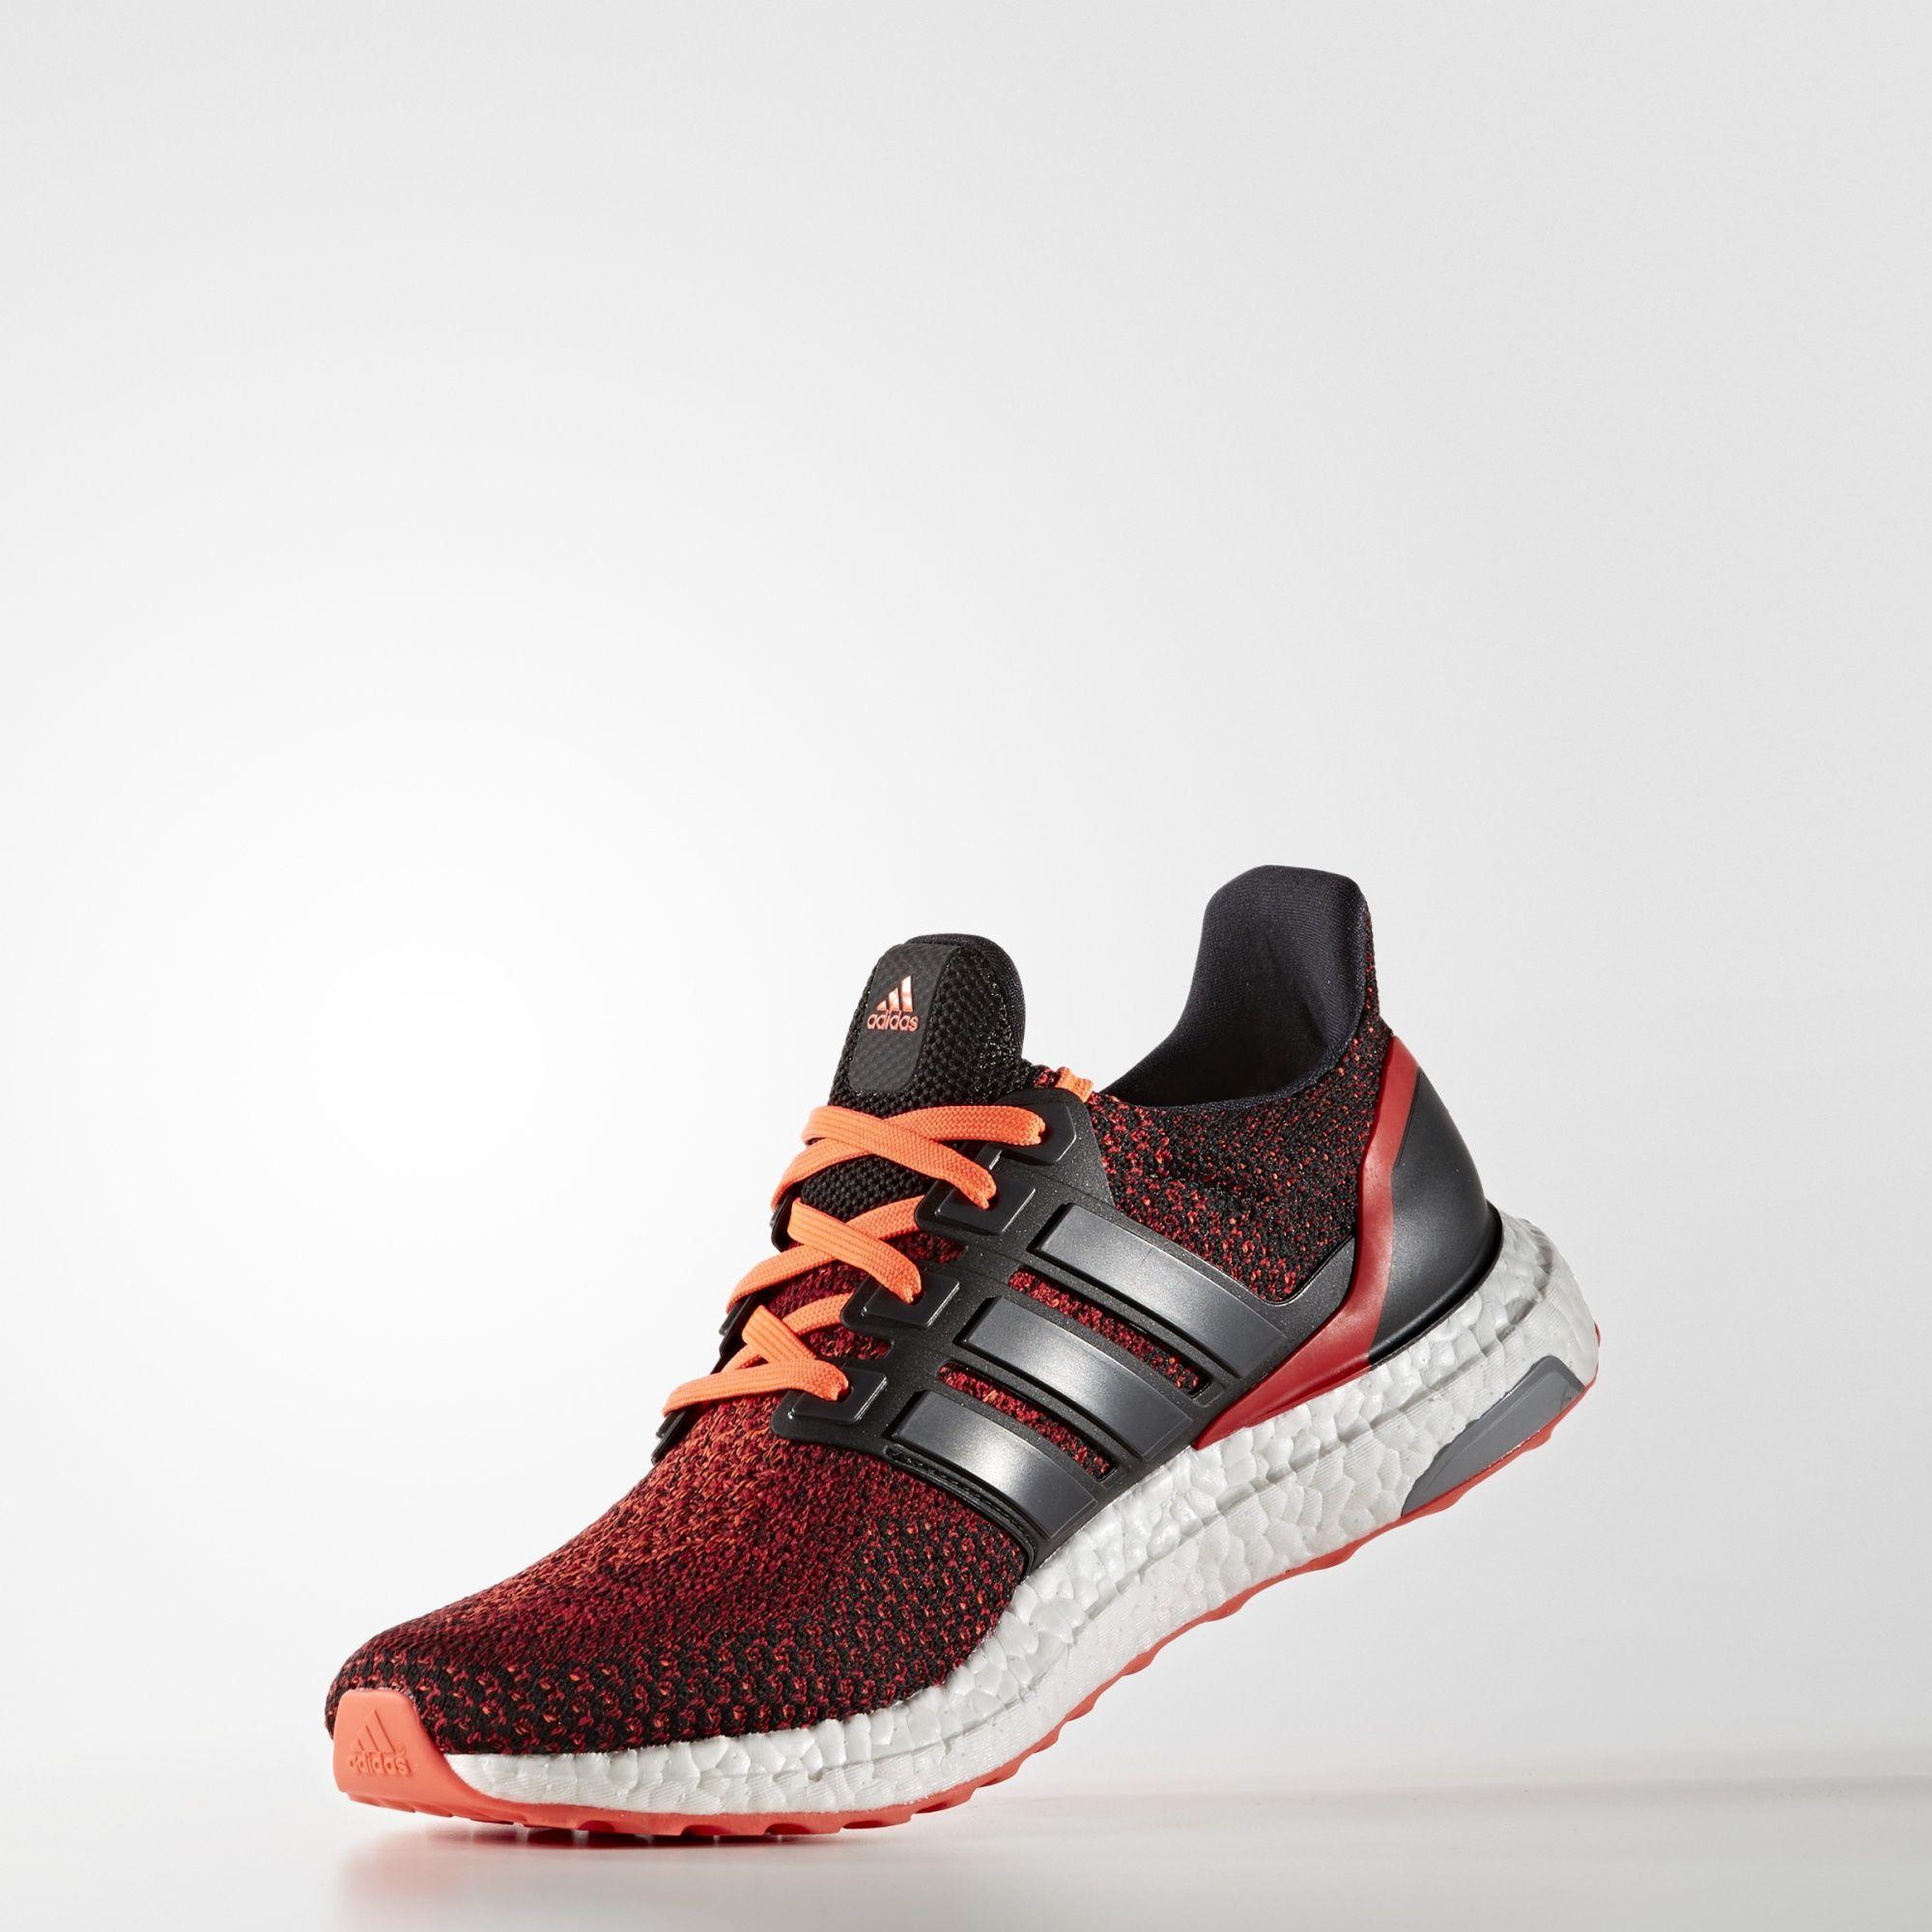 Adidas ultraboost m scarpe adidas pinterest ultraboost